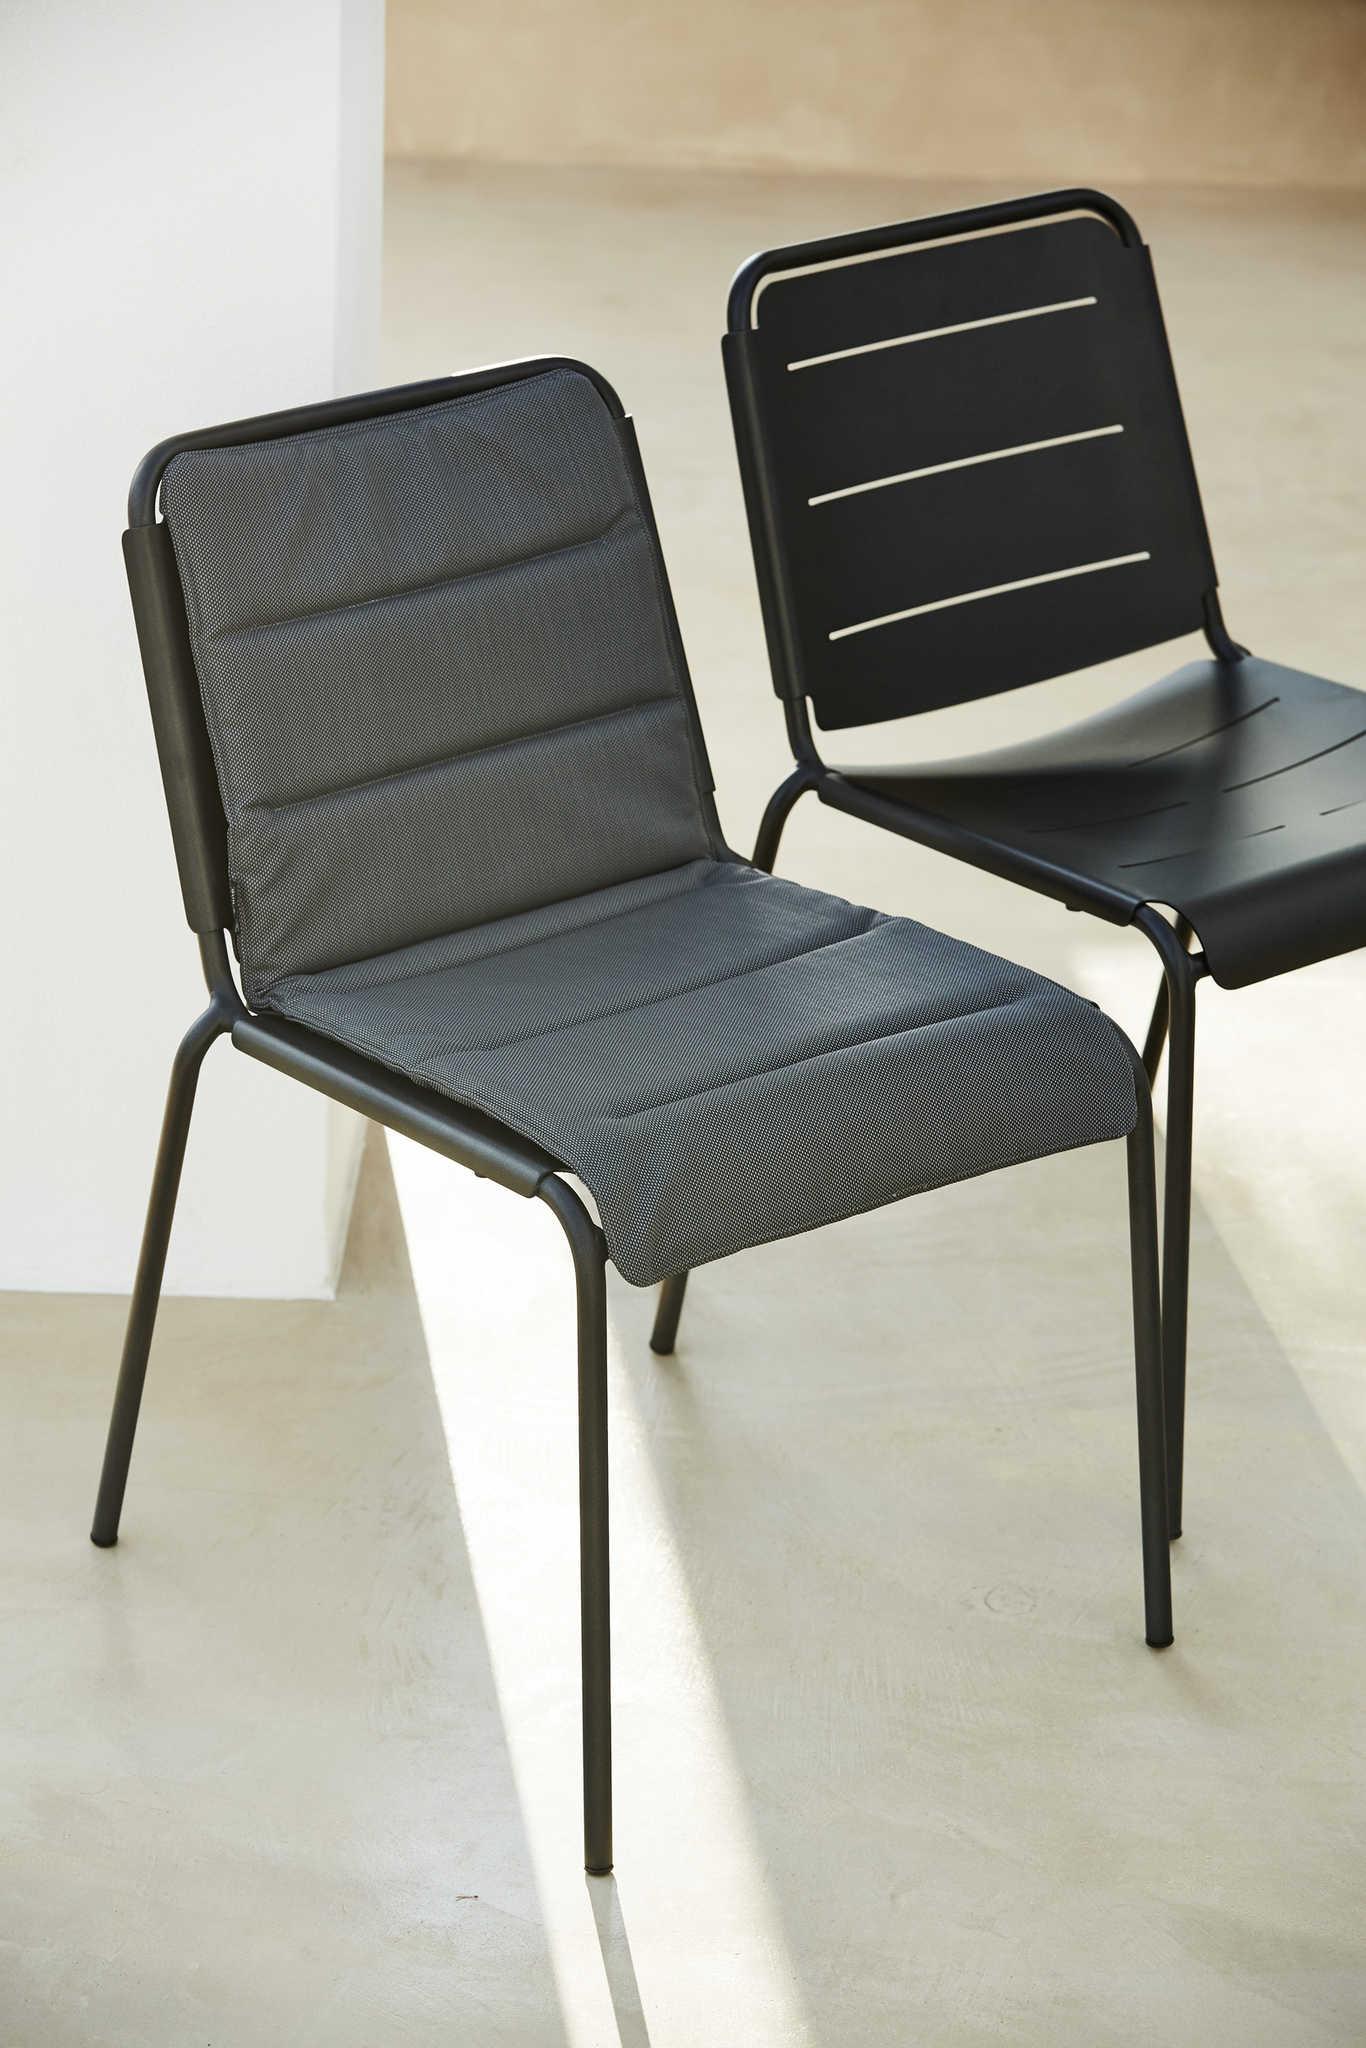 Copenhagen stuhl ohne armlehne cane line wohnkultur cane for Stuhl armlehne